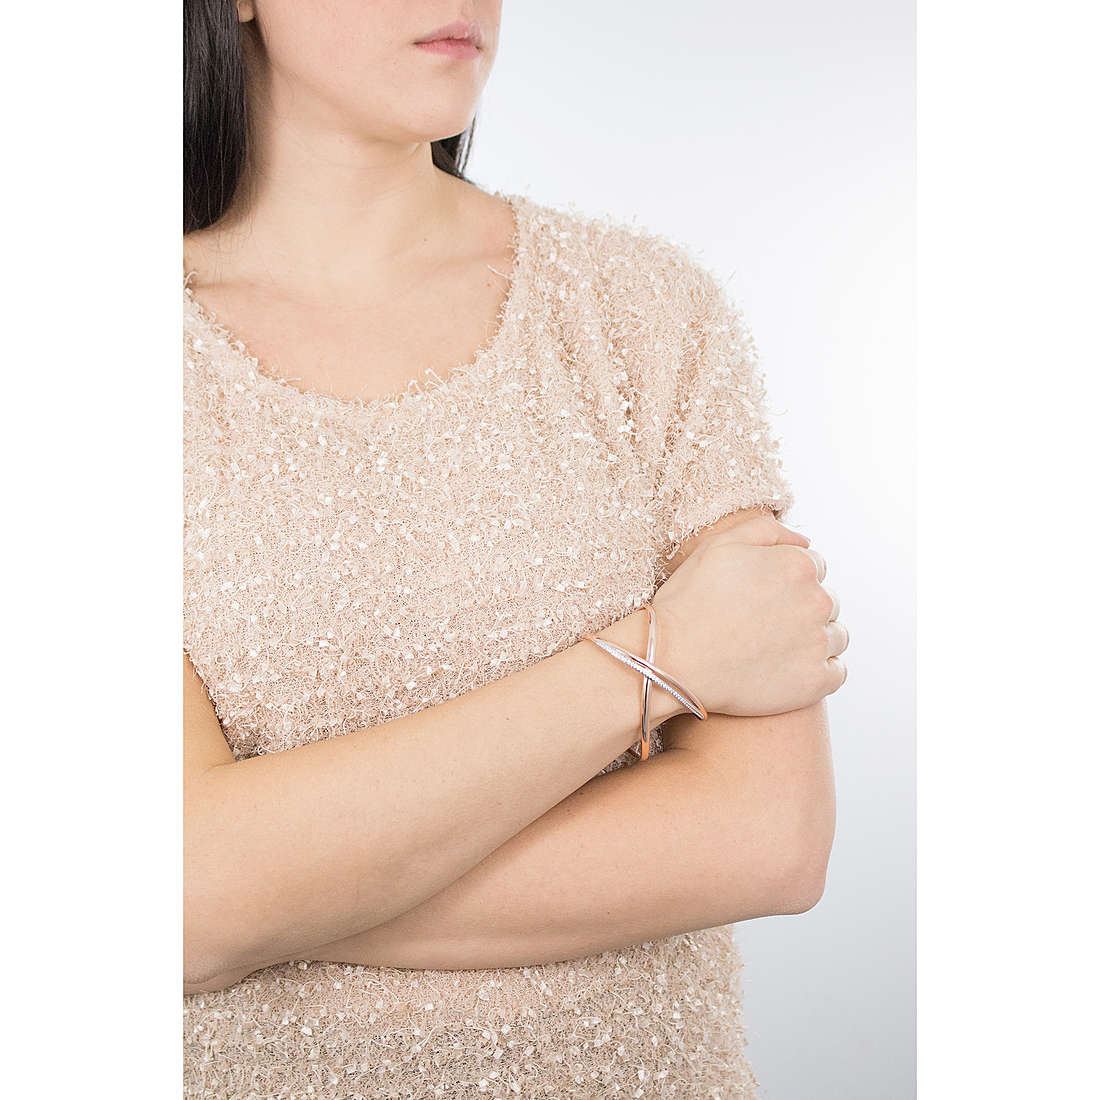 Brosway bracciali Ribbon donna BBN12 indosso